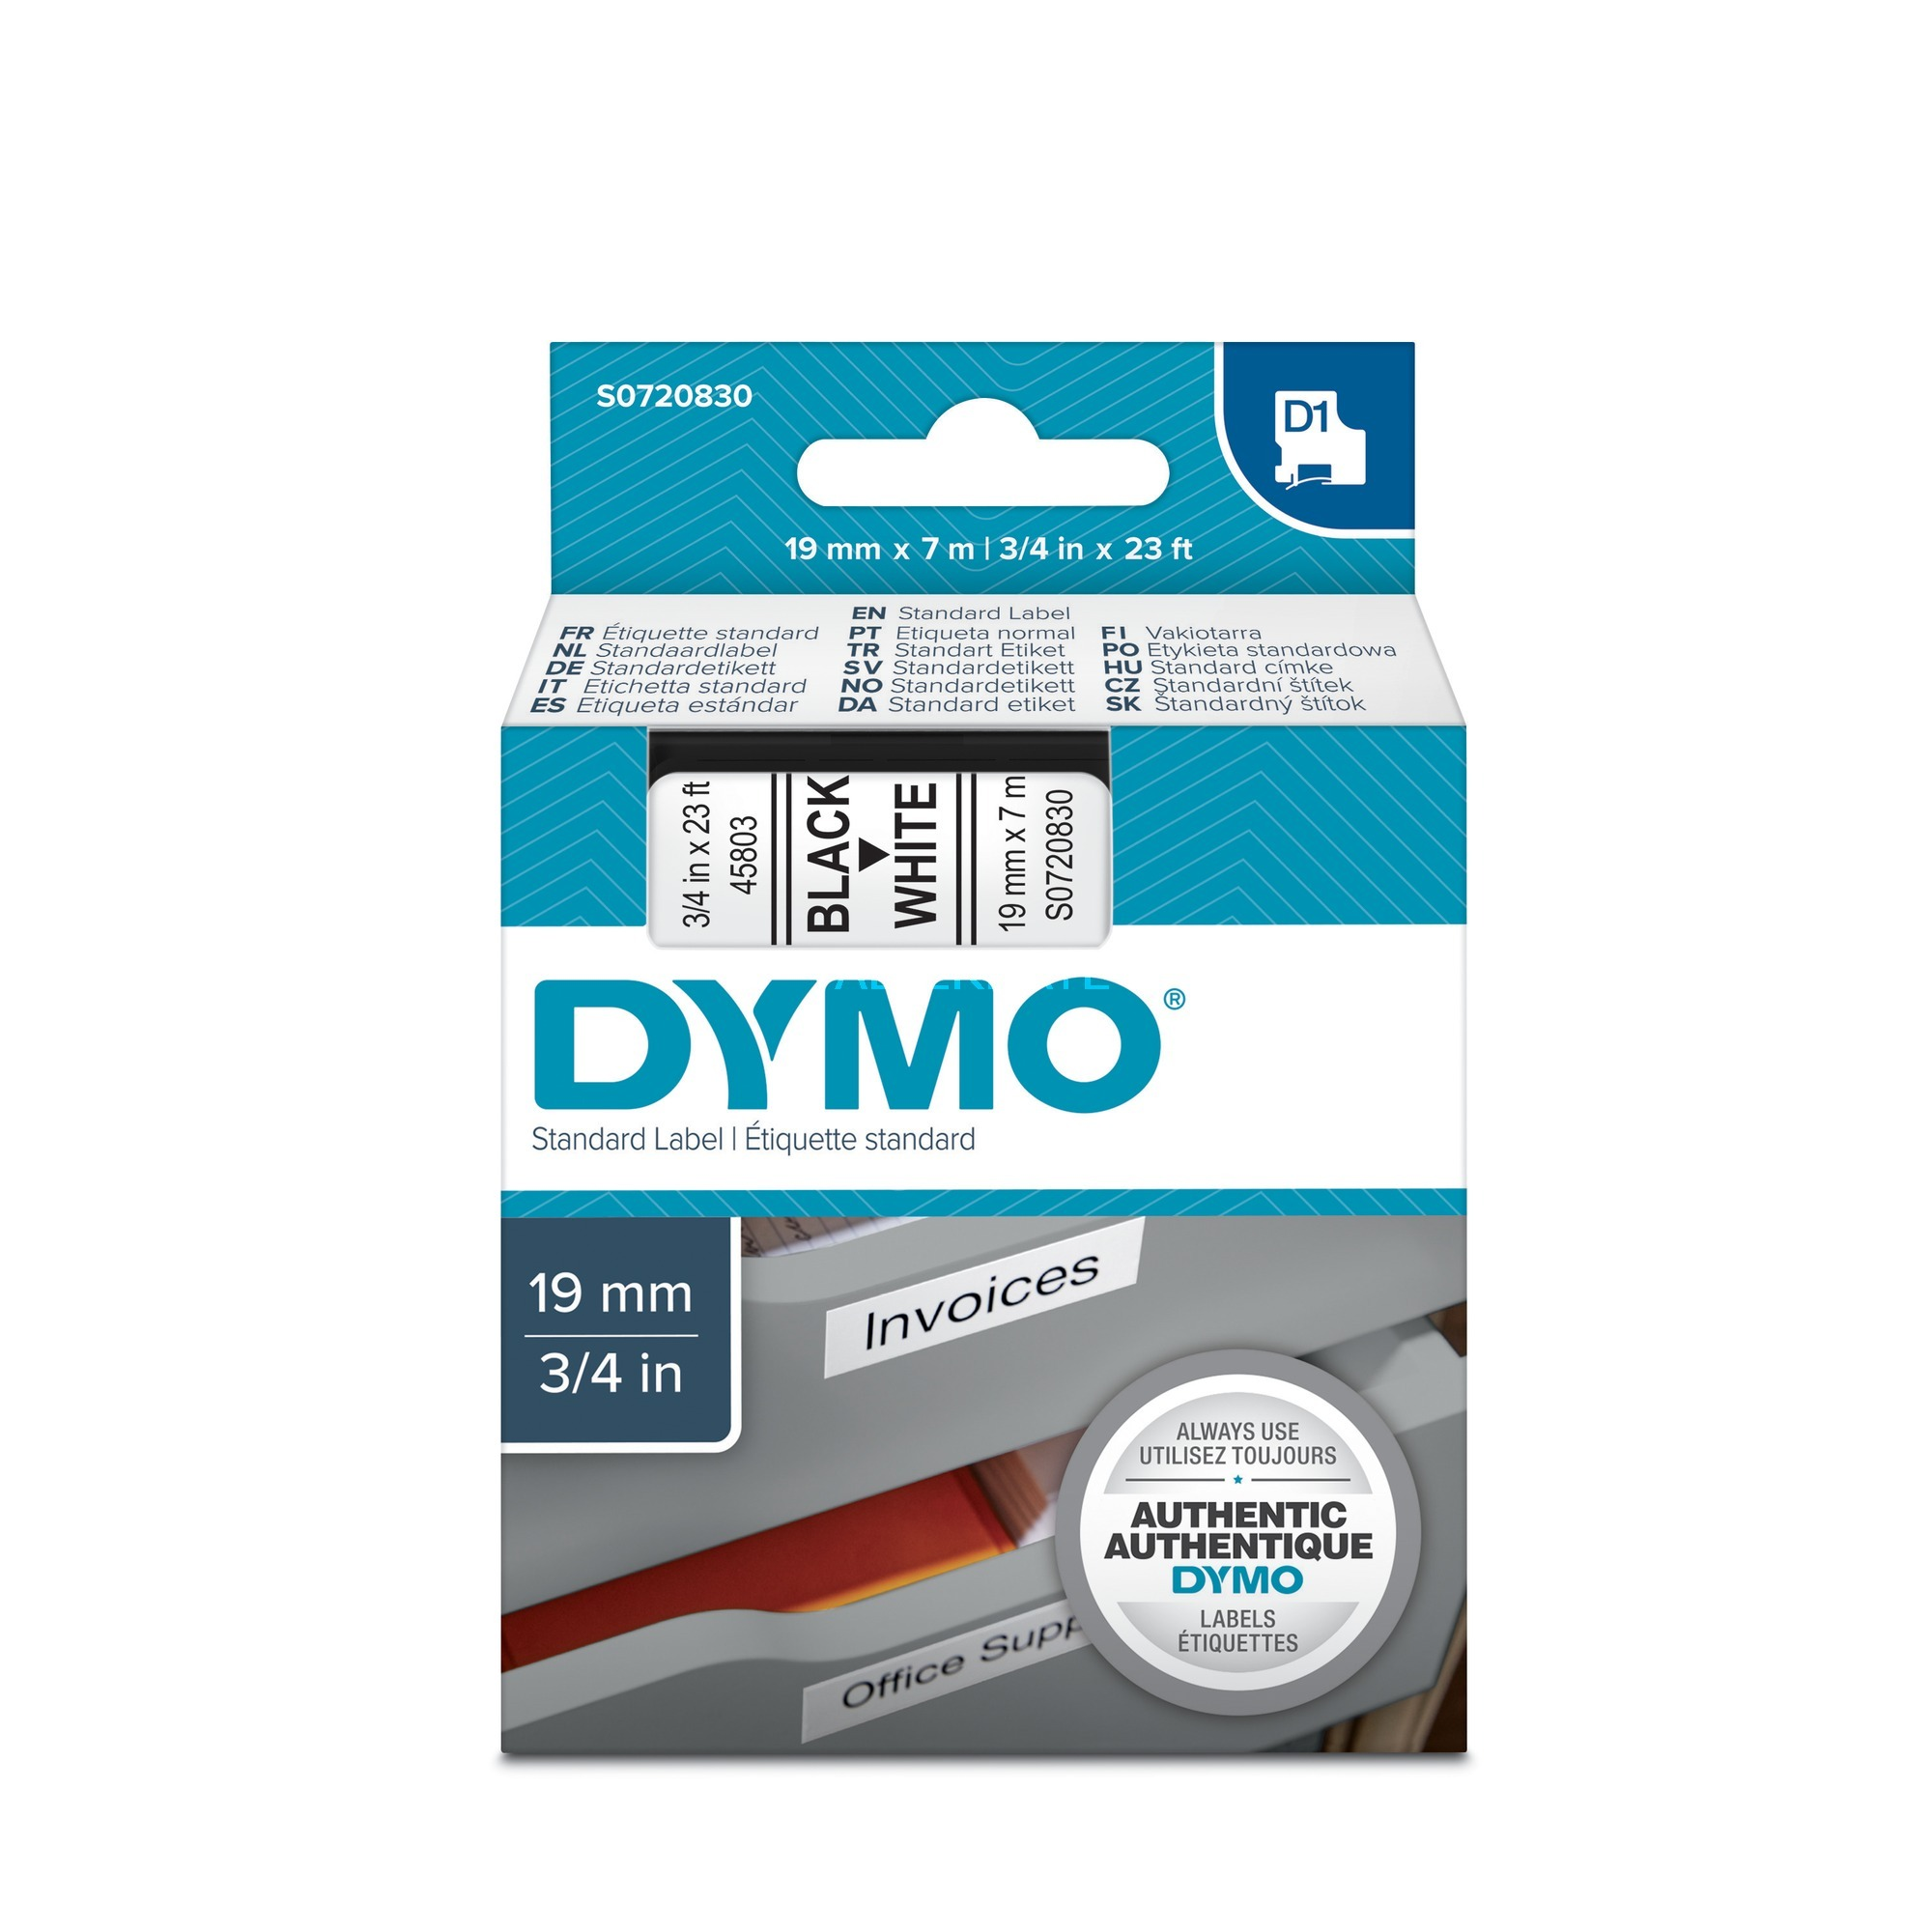 D1 Standard 19mm x 7m D1 cinta para impresora de etiquetas, Cinta de escritura